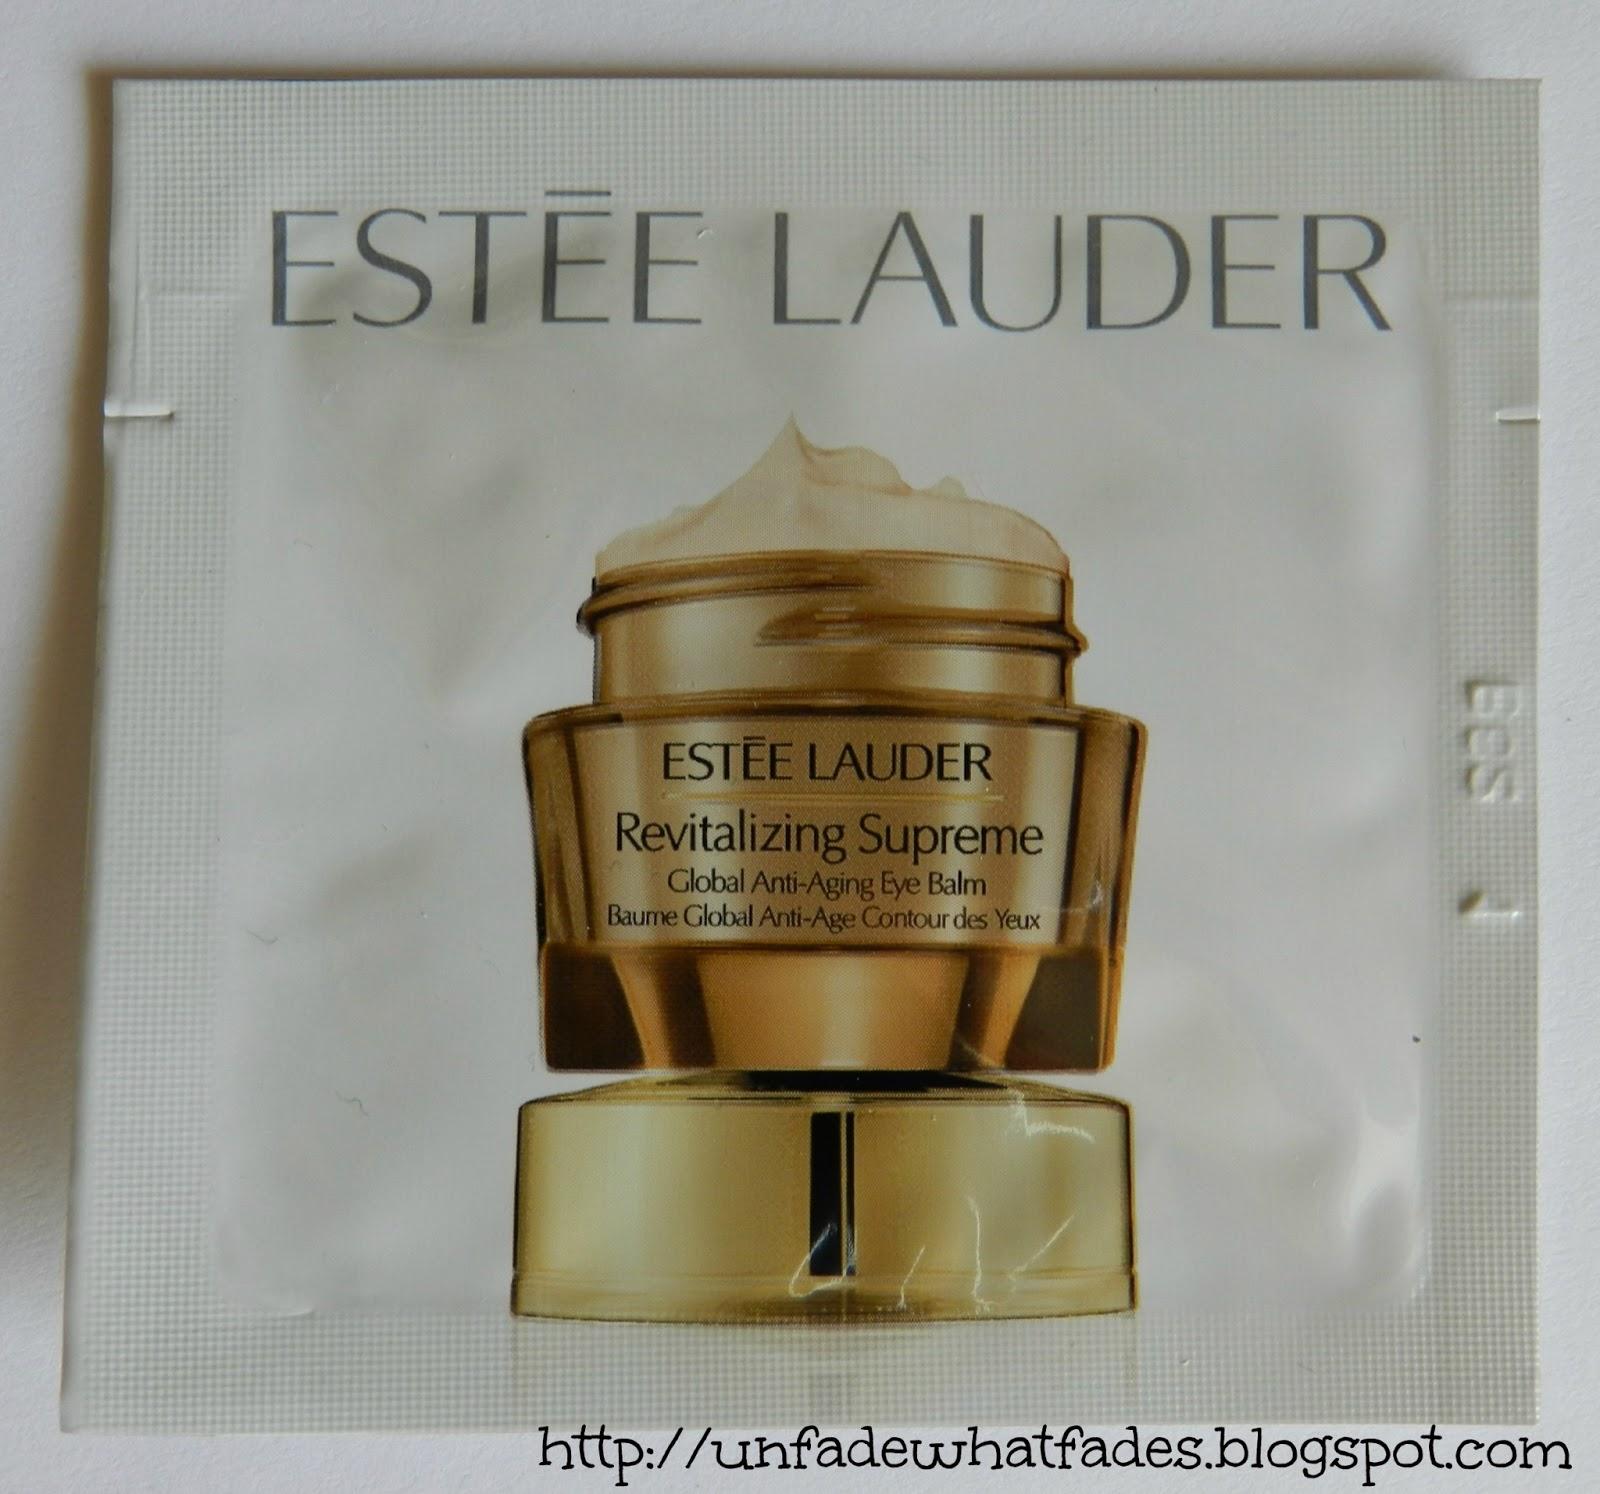 5dff8bc5b1d7b Unfade what fades  Estee Lauder Revitalizing Supreme Global Anti ...